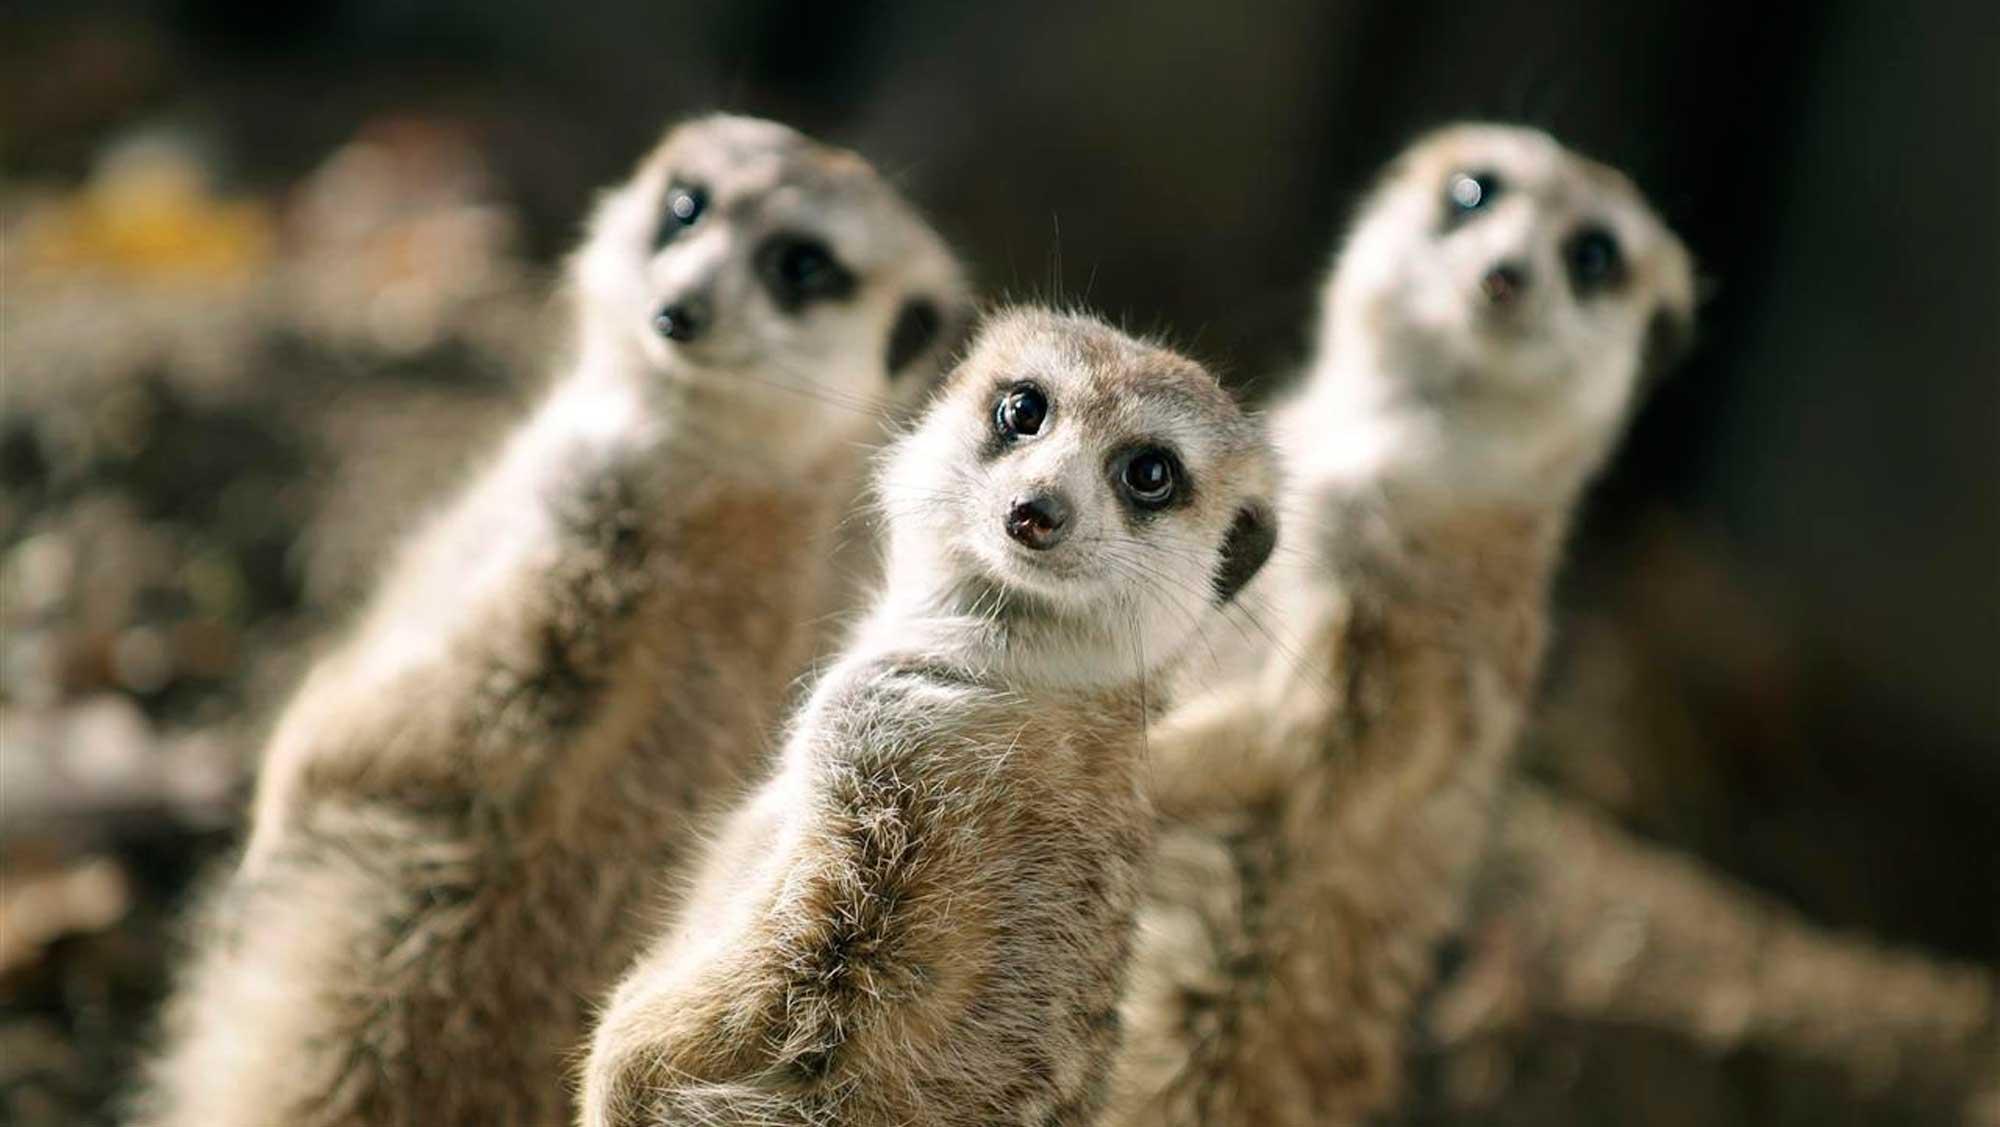 Omgeving Molecaten Park Landgoed Ginkelduin 12 dierenpark Amersfoort